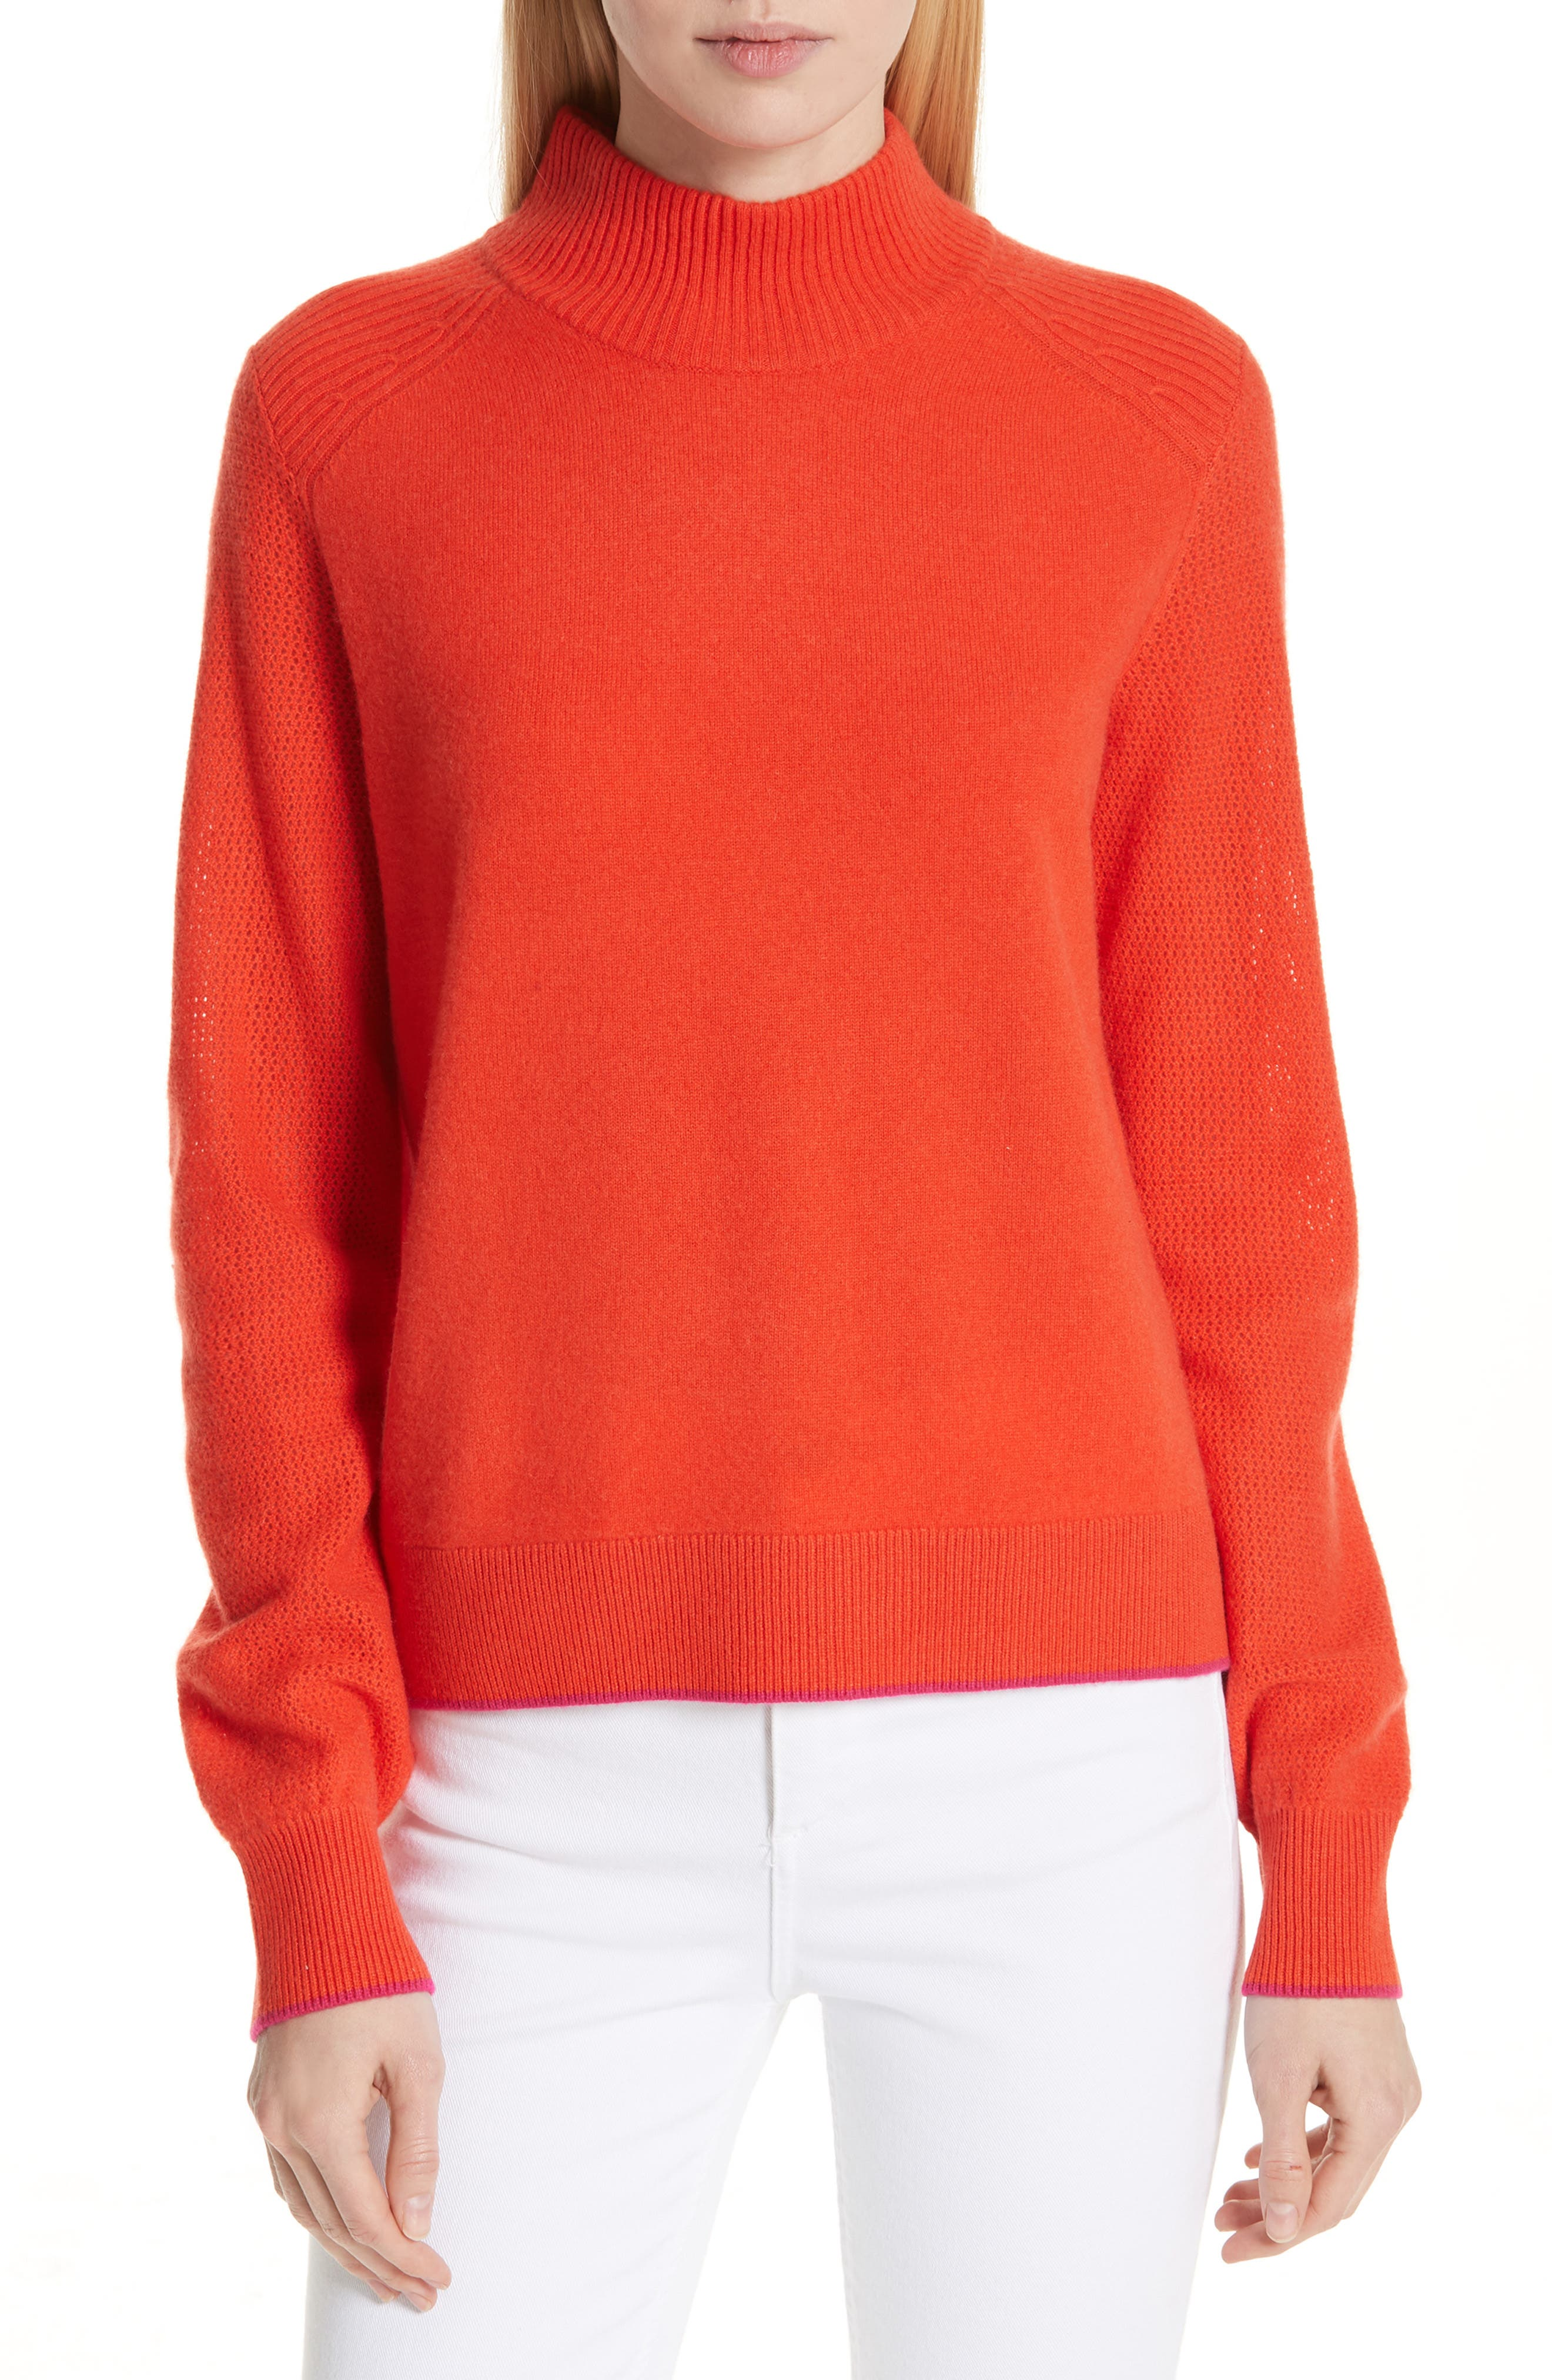 Rag & Bone Yorke Cashmere Sweater, Red